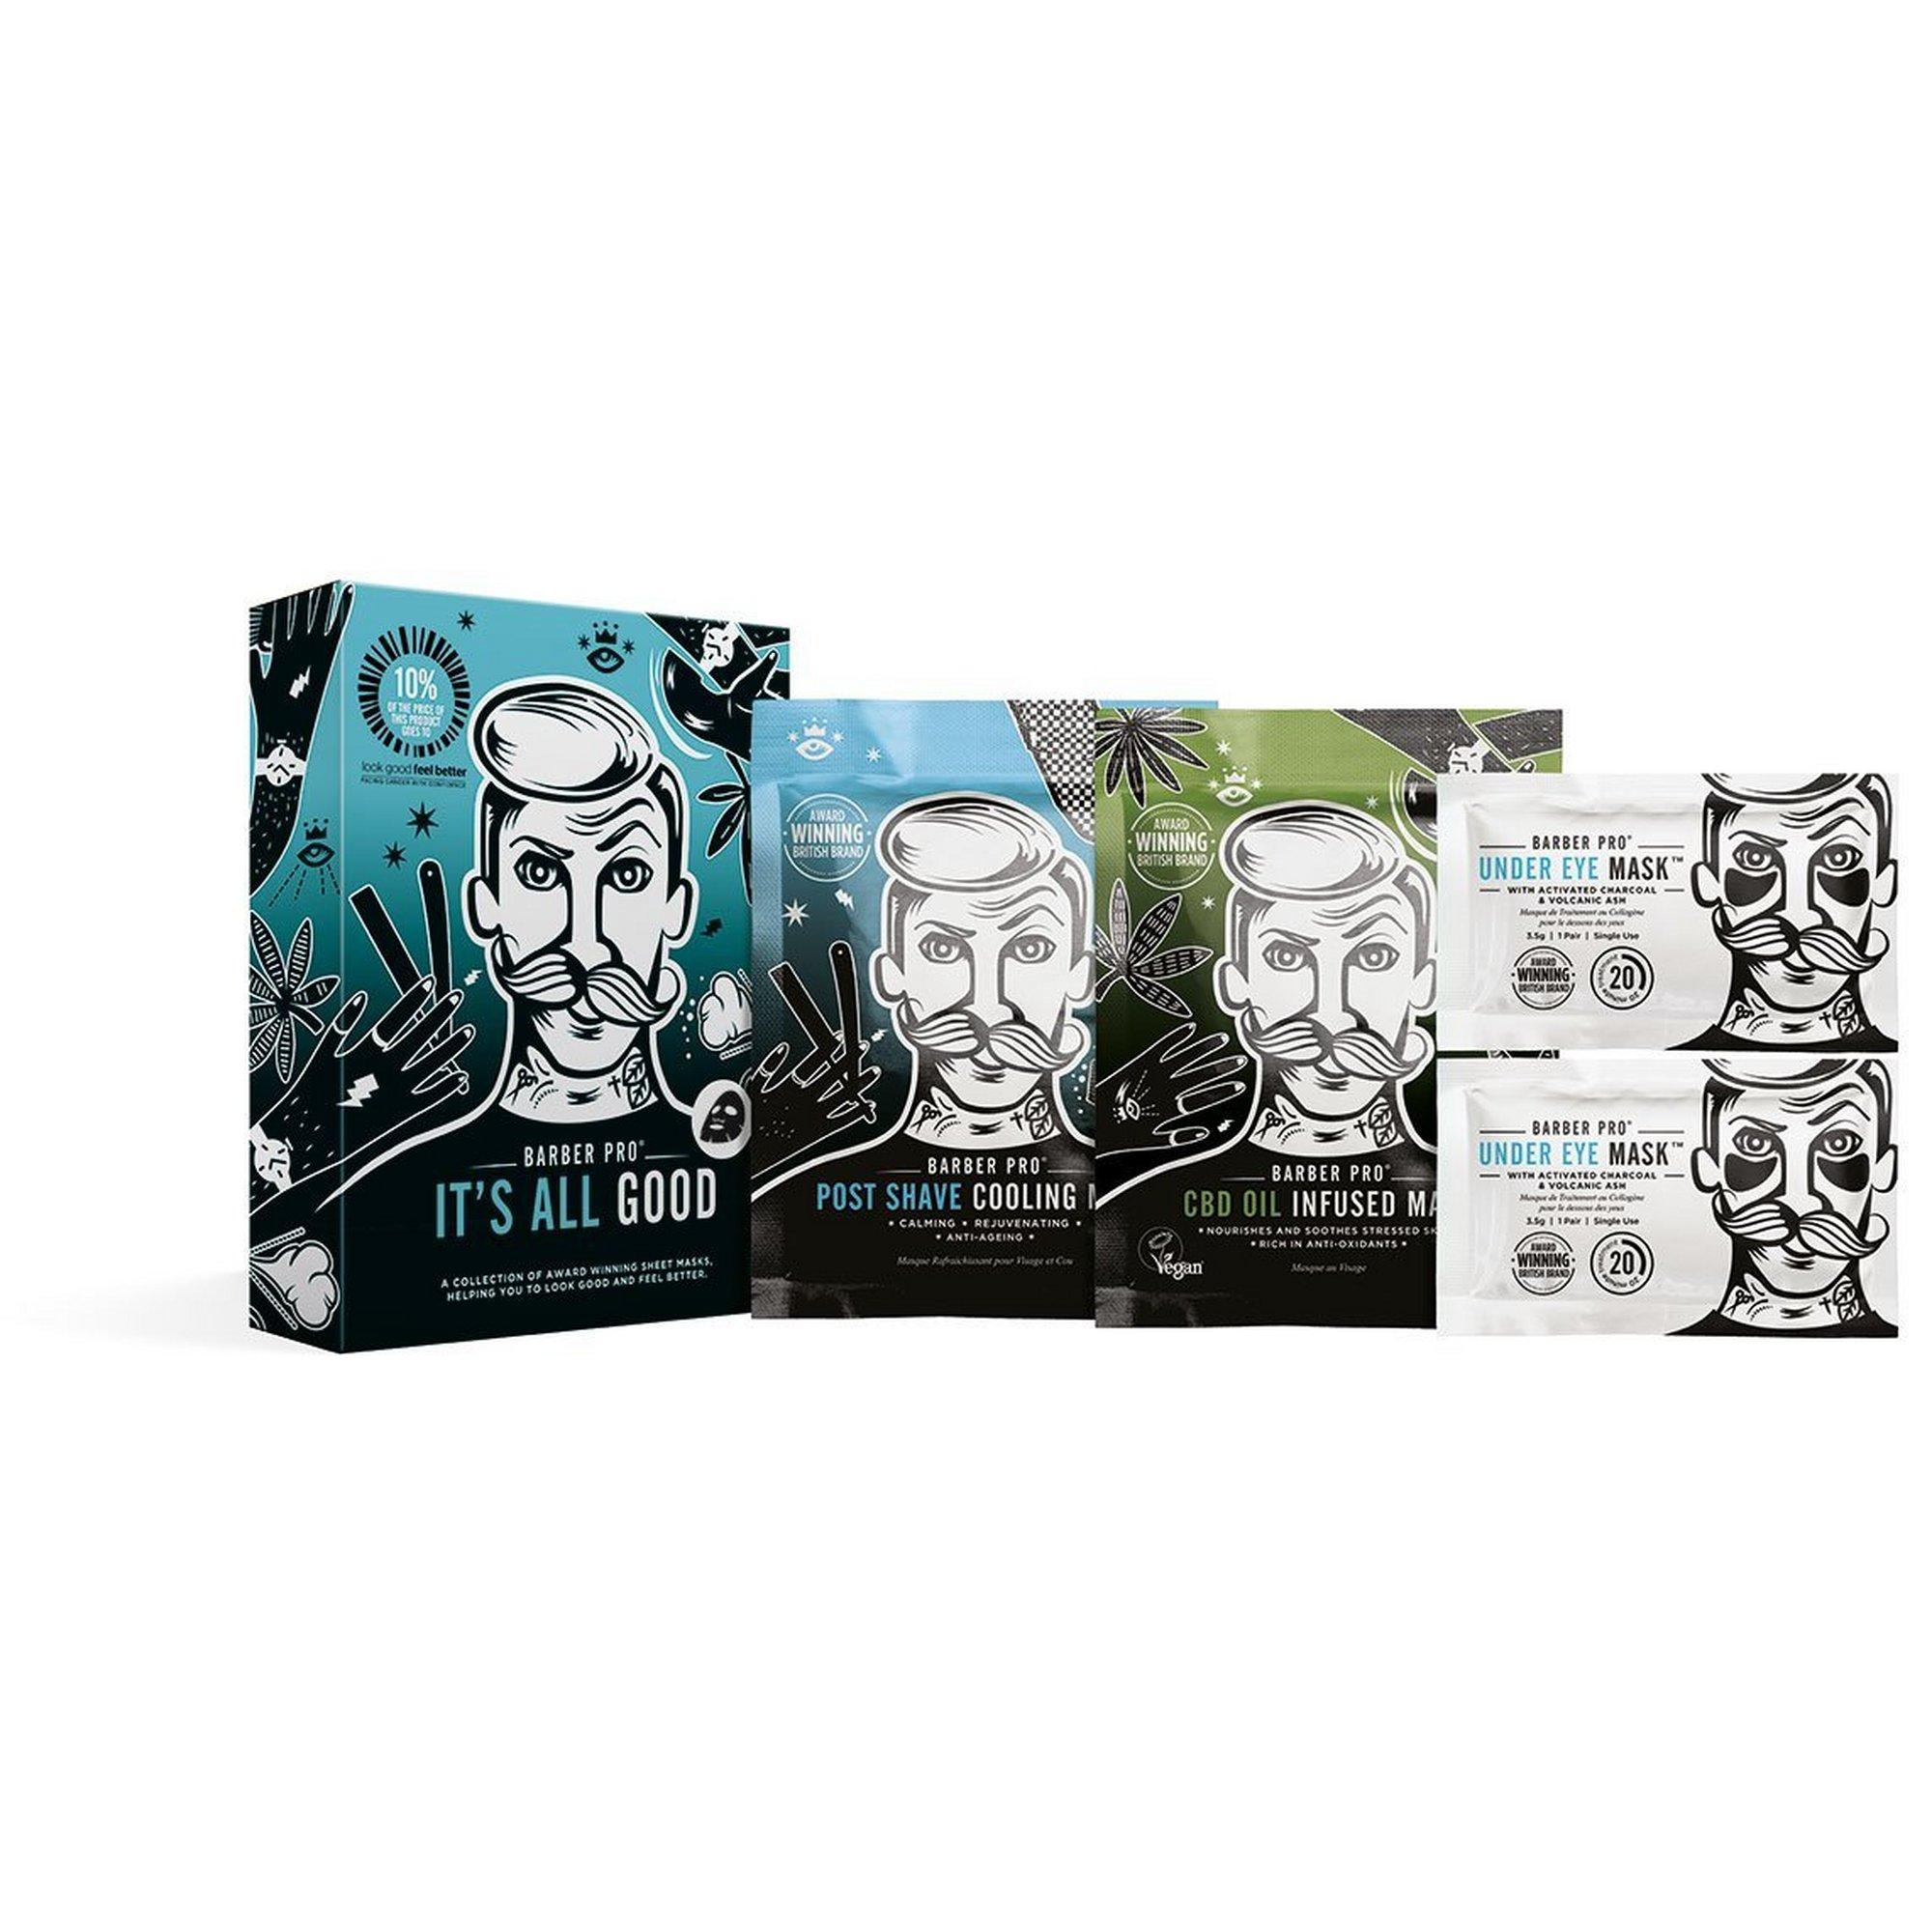 Image of Barber Pro Its all good Mens Face Mask Set